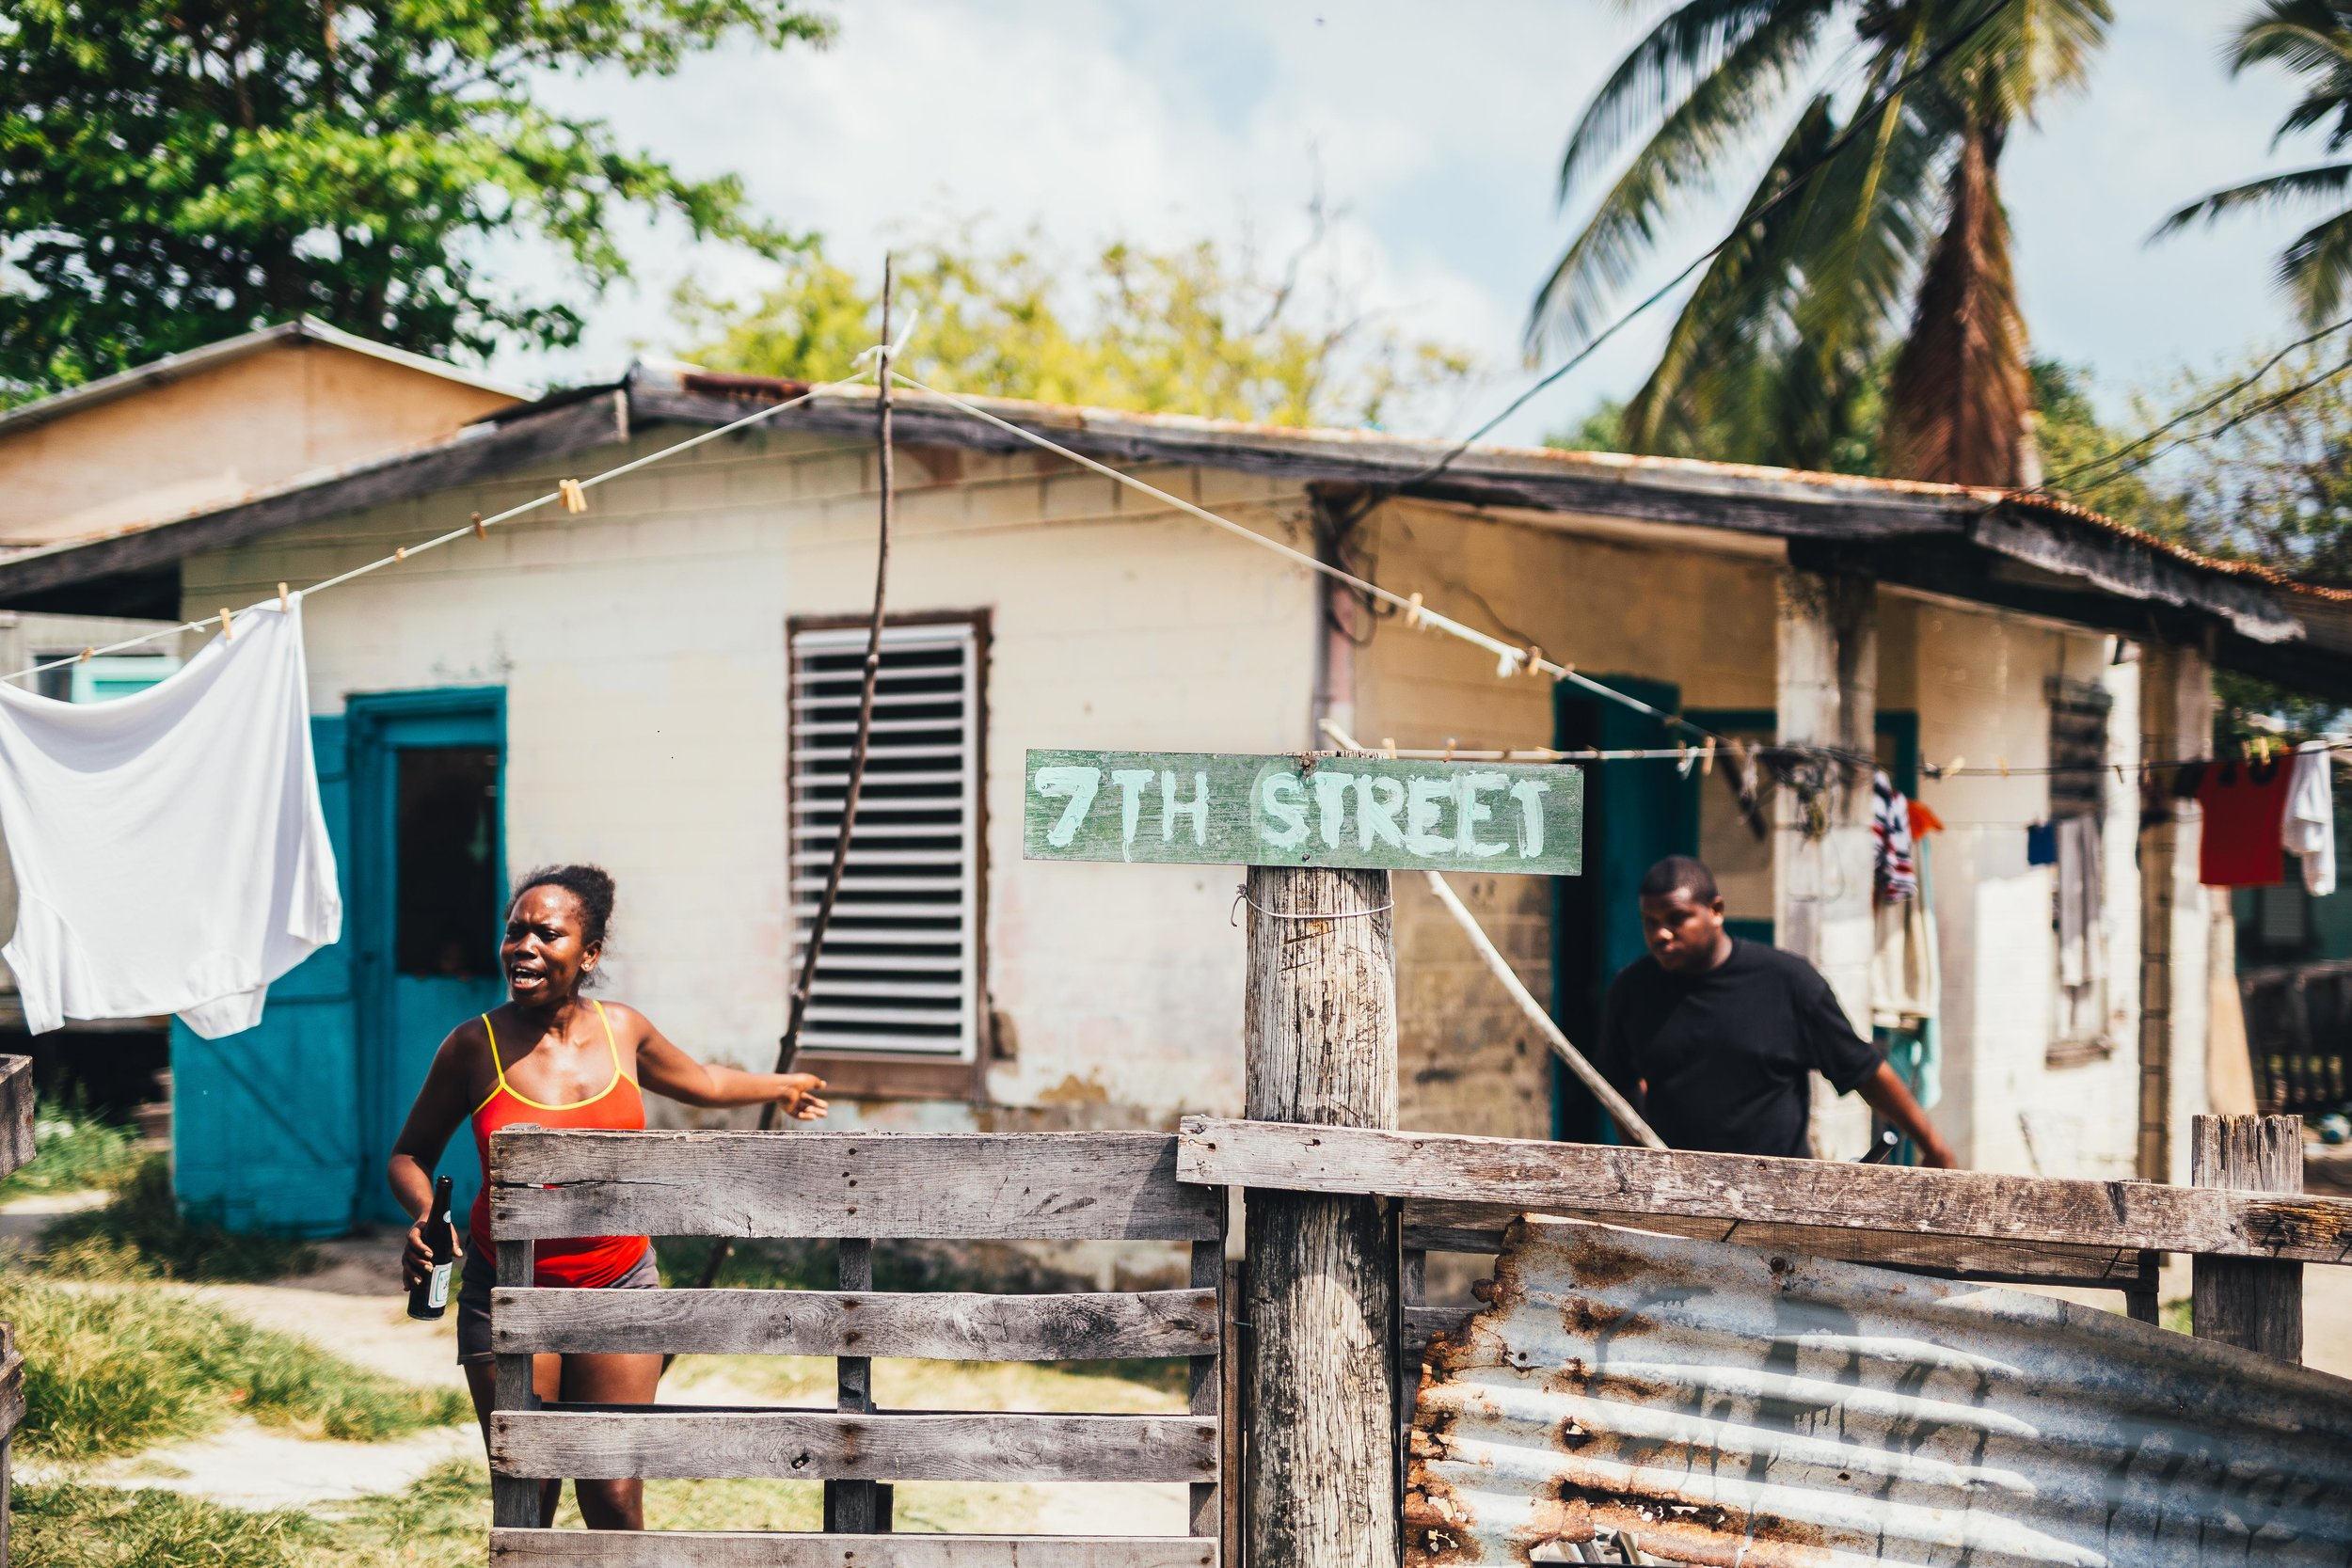 Belize_Day_12017_02_26_233207-7629_SLW.jpg